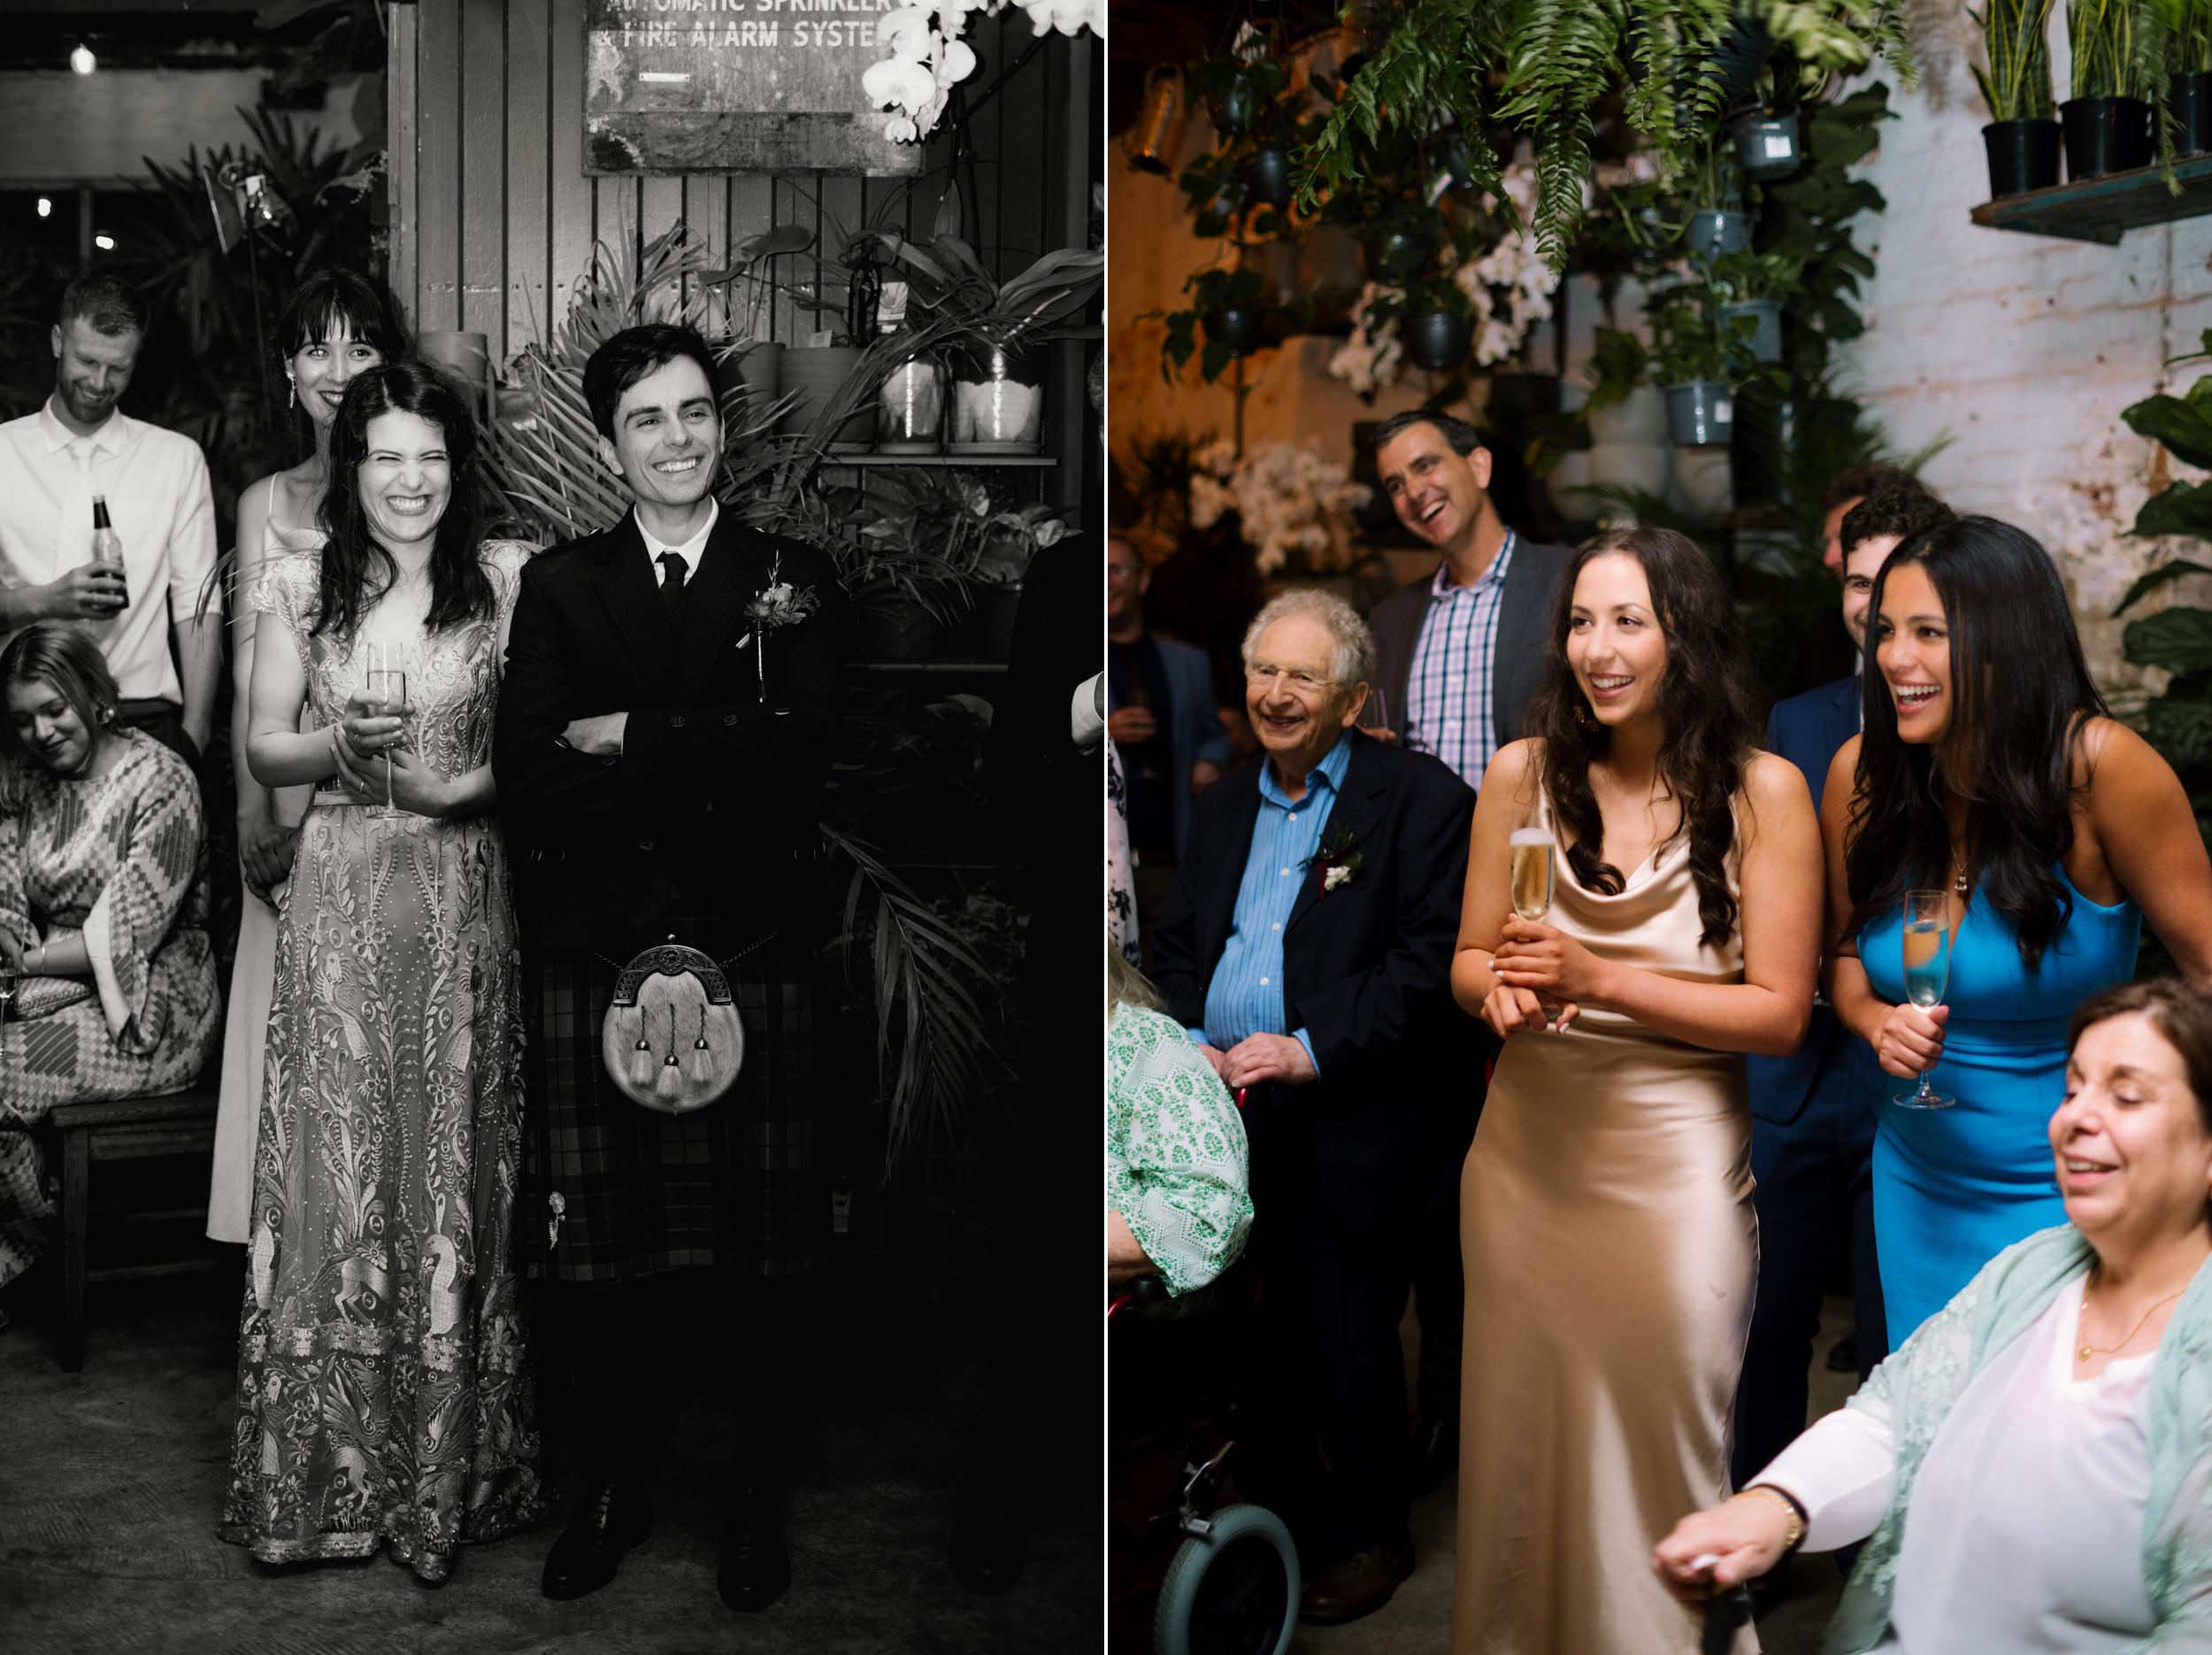 I-Got-You-Babe-&.Co.-Glasshaus-Wedding-Charlotte-Cameron0132.JPG